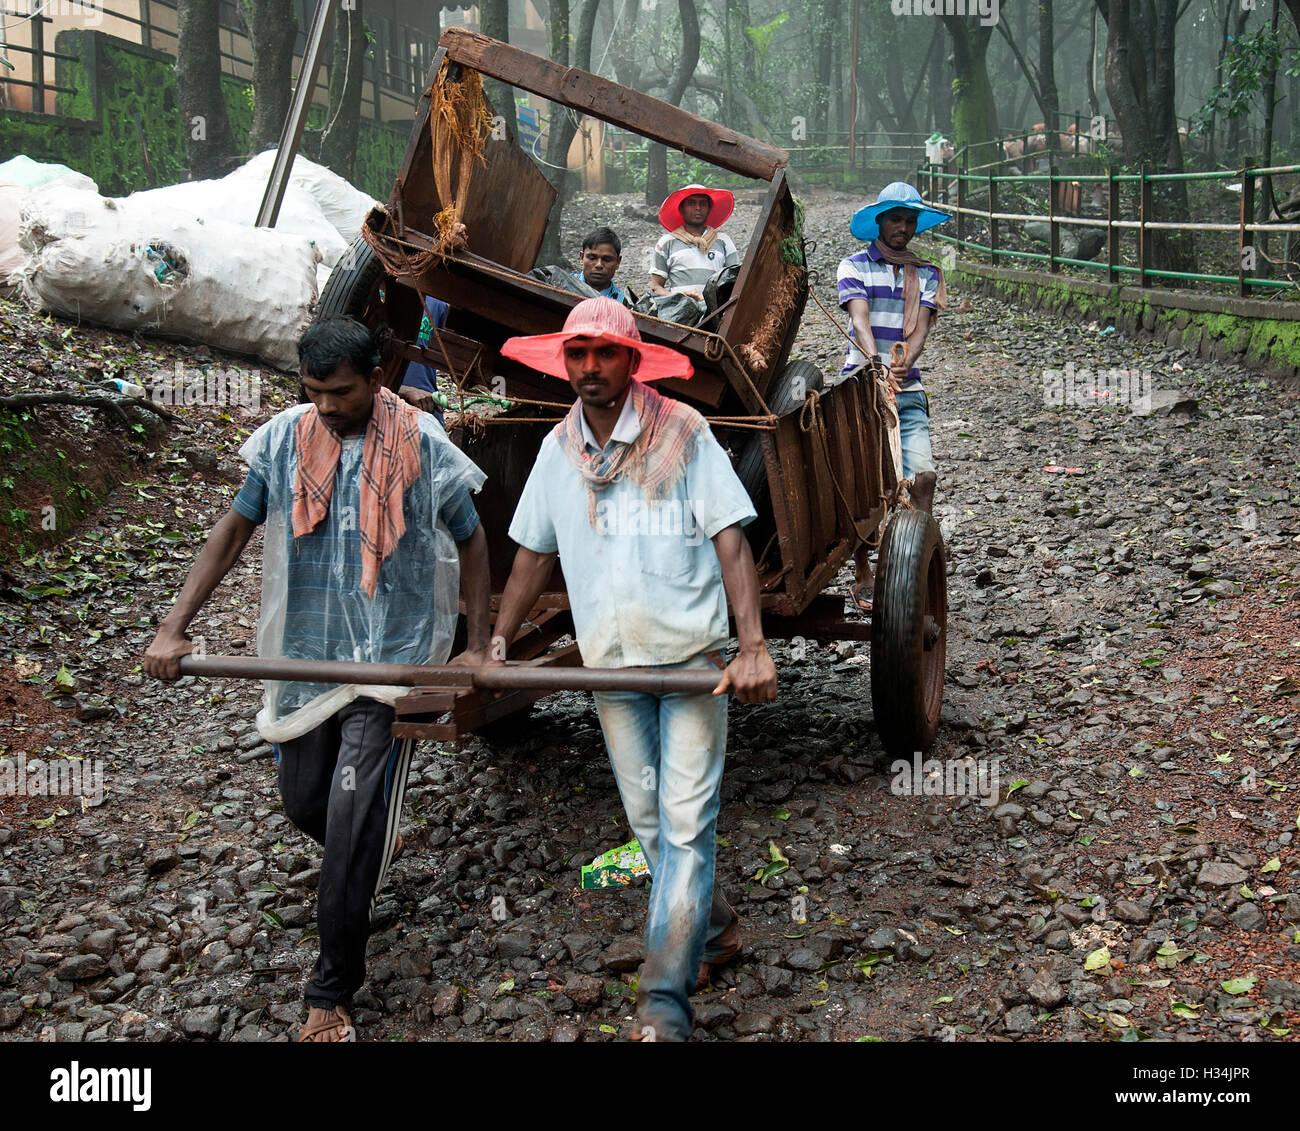 The image of Cart puller with luggage in Matheran, Maharashtra, India - Stock Image